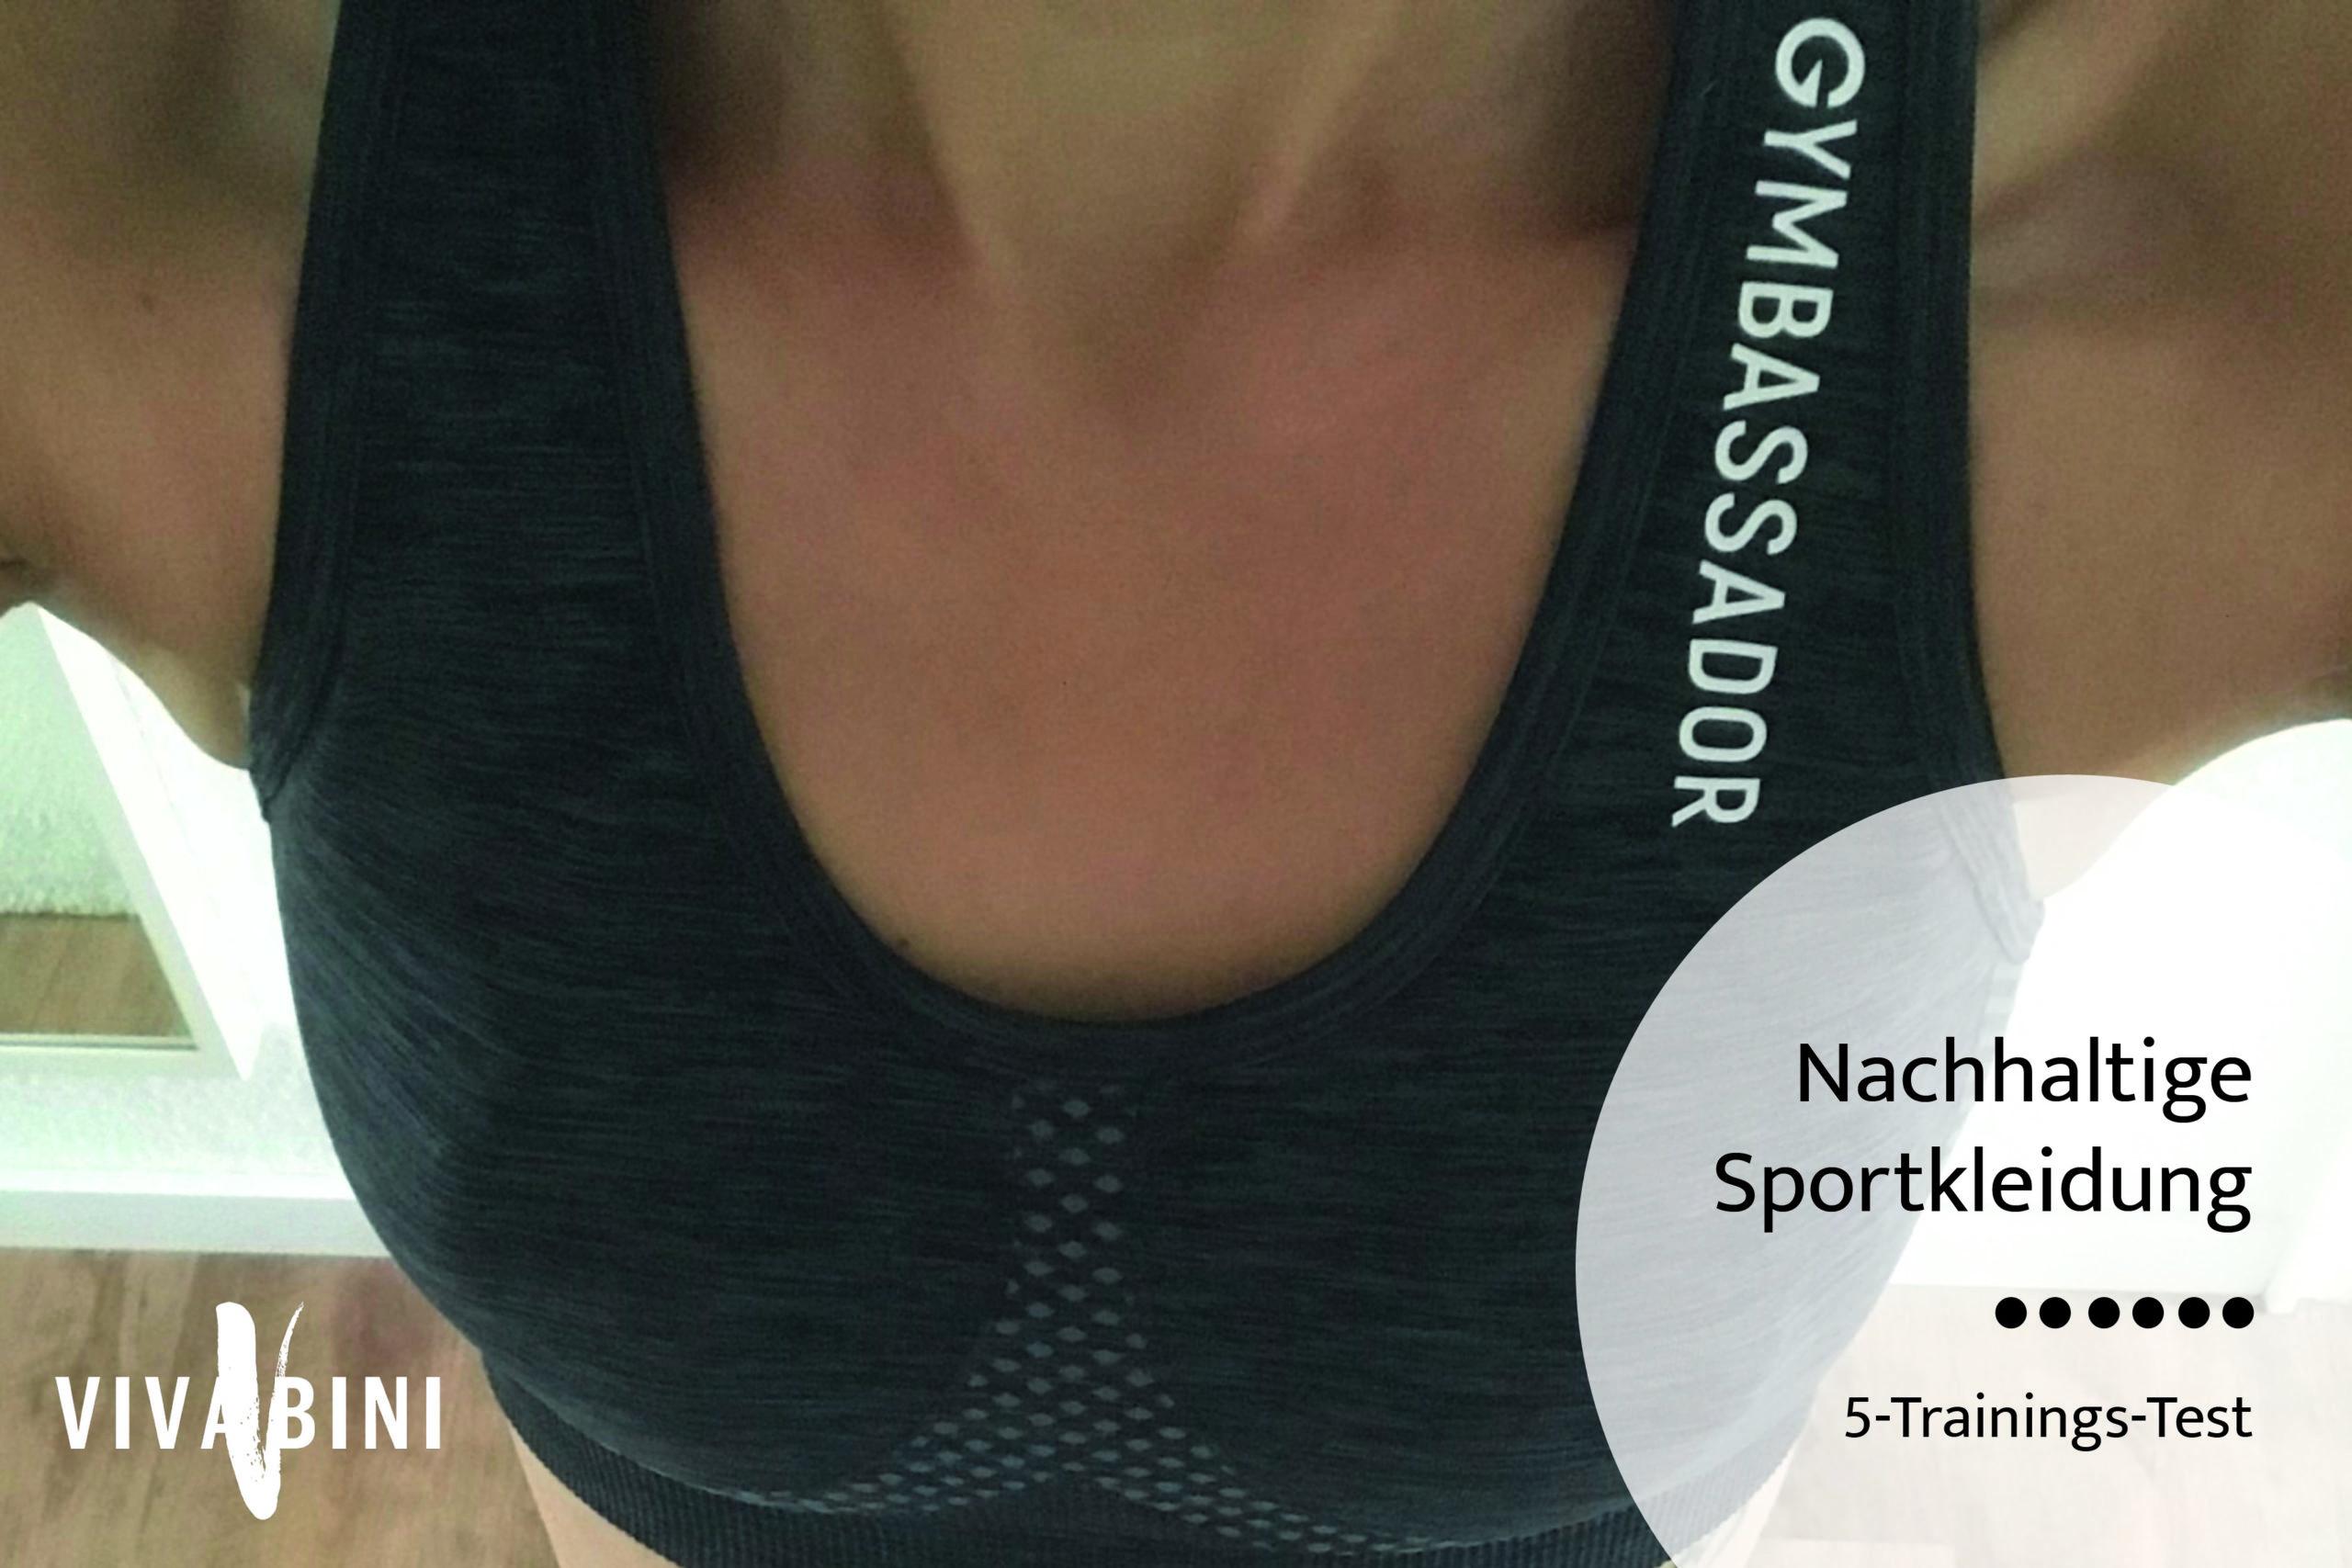 Gymbassador Testbericht nachhaltige Sportbekleidung